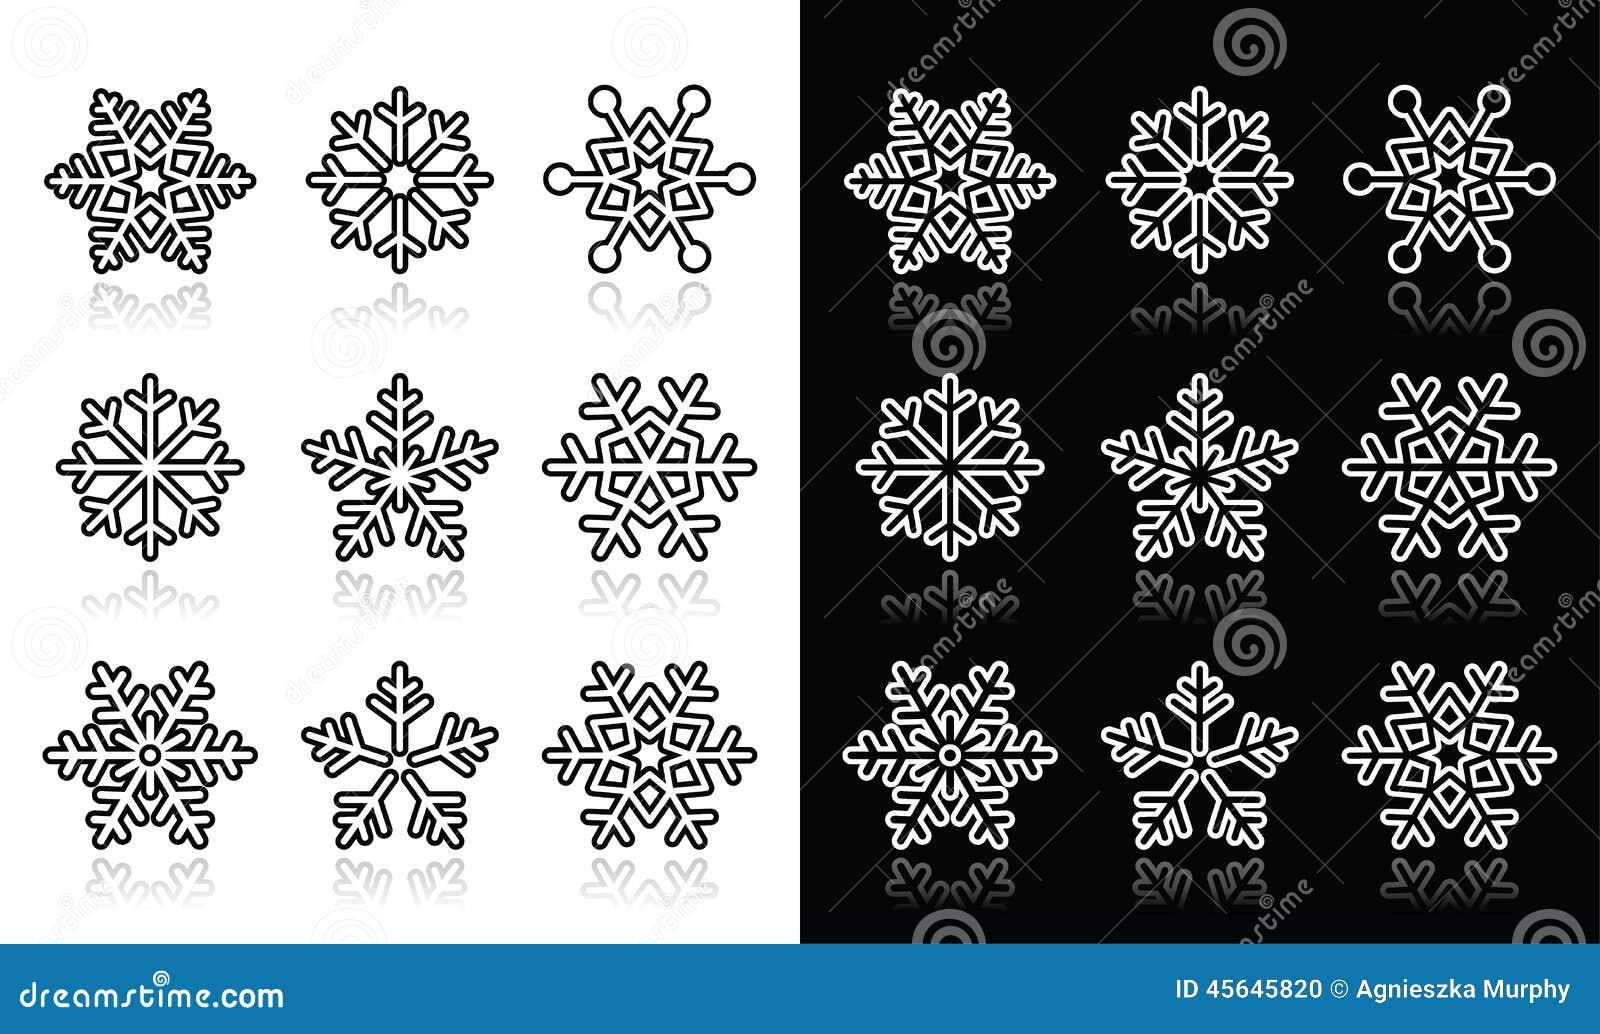 снежинки чёрно белые картинки